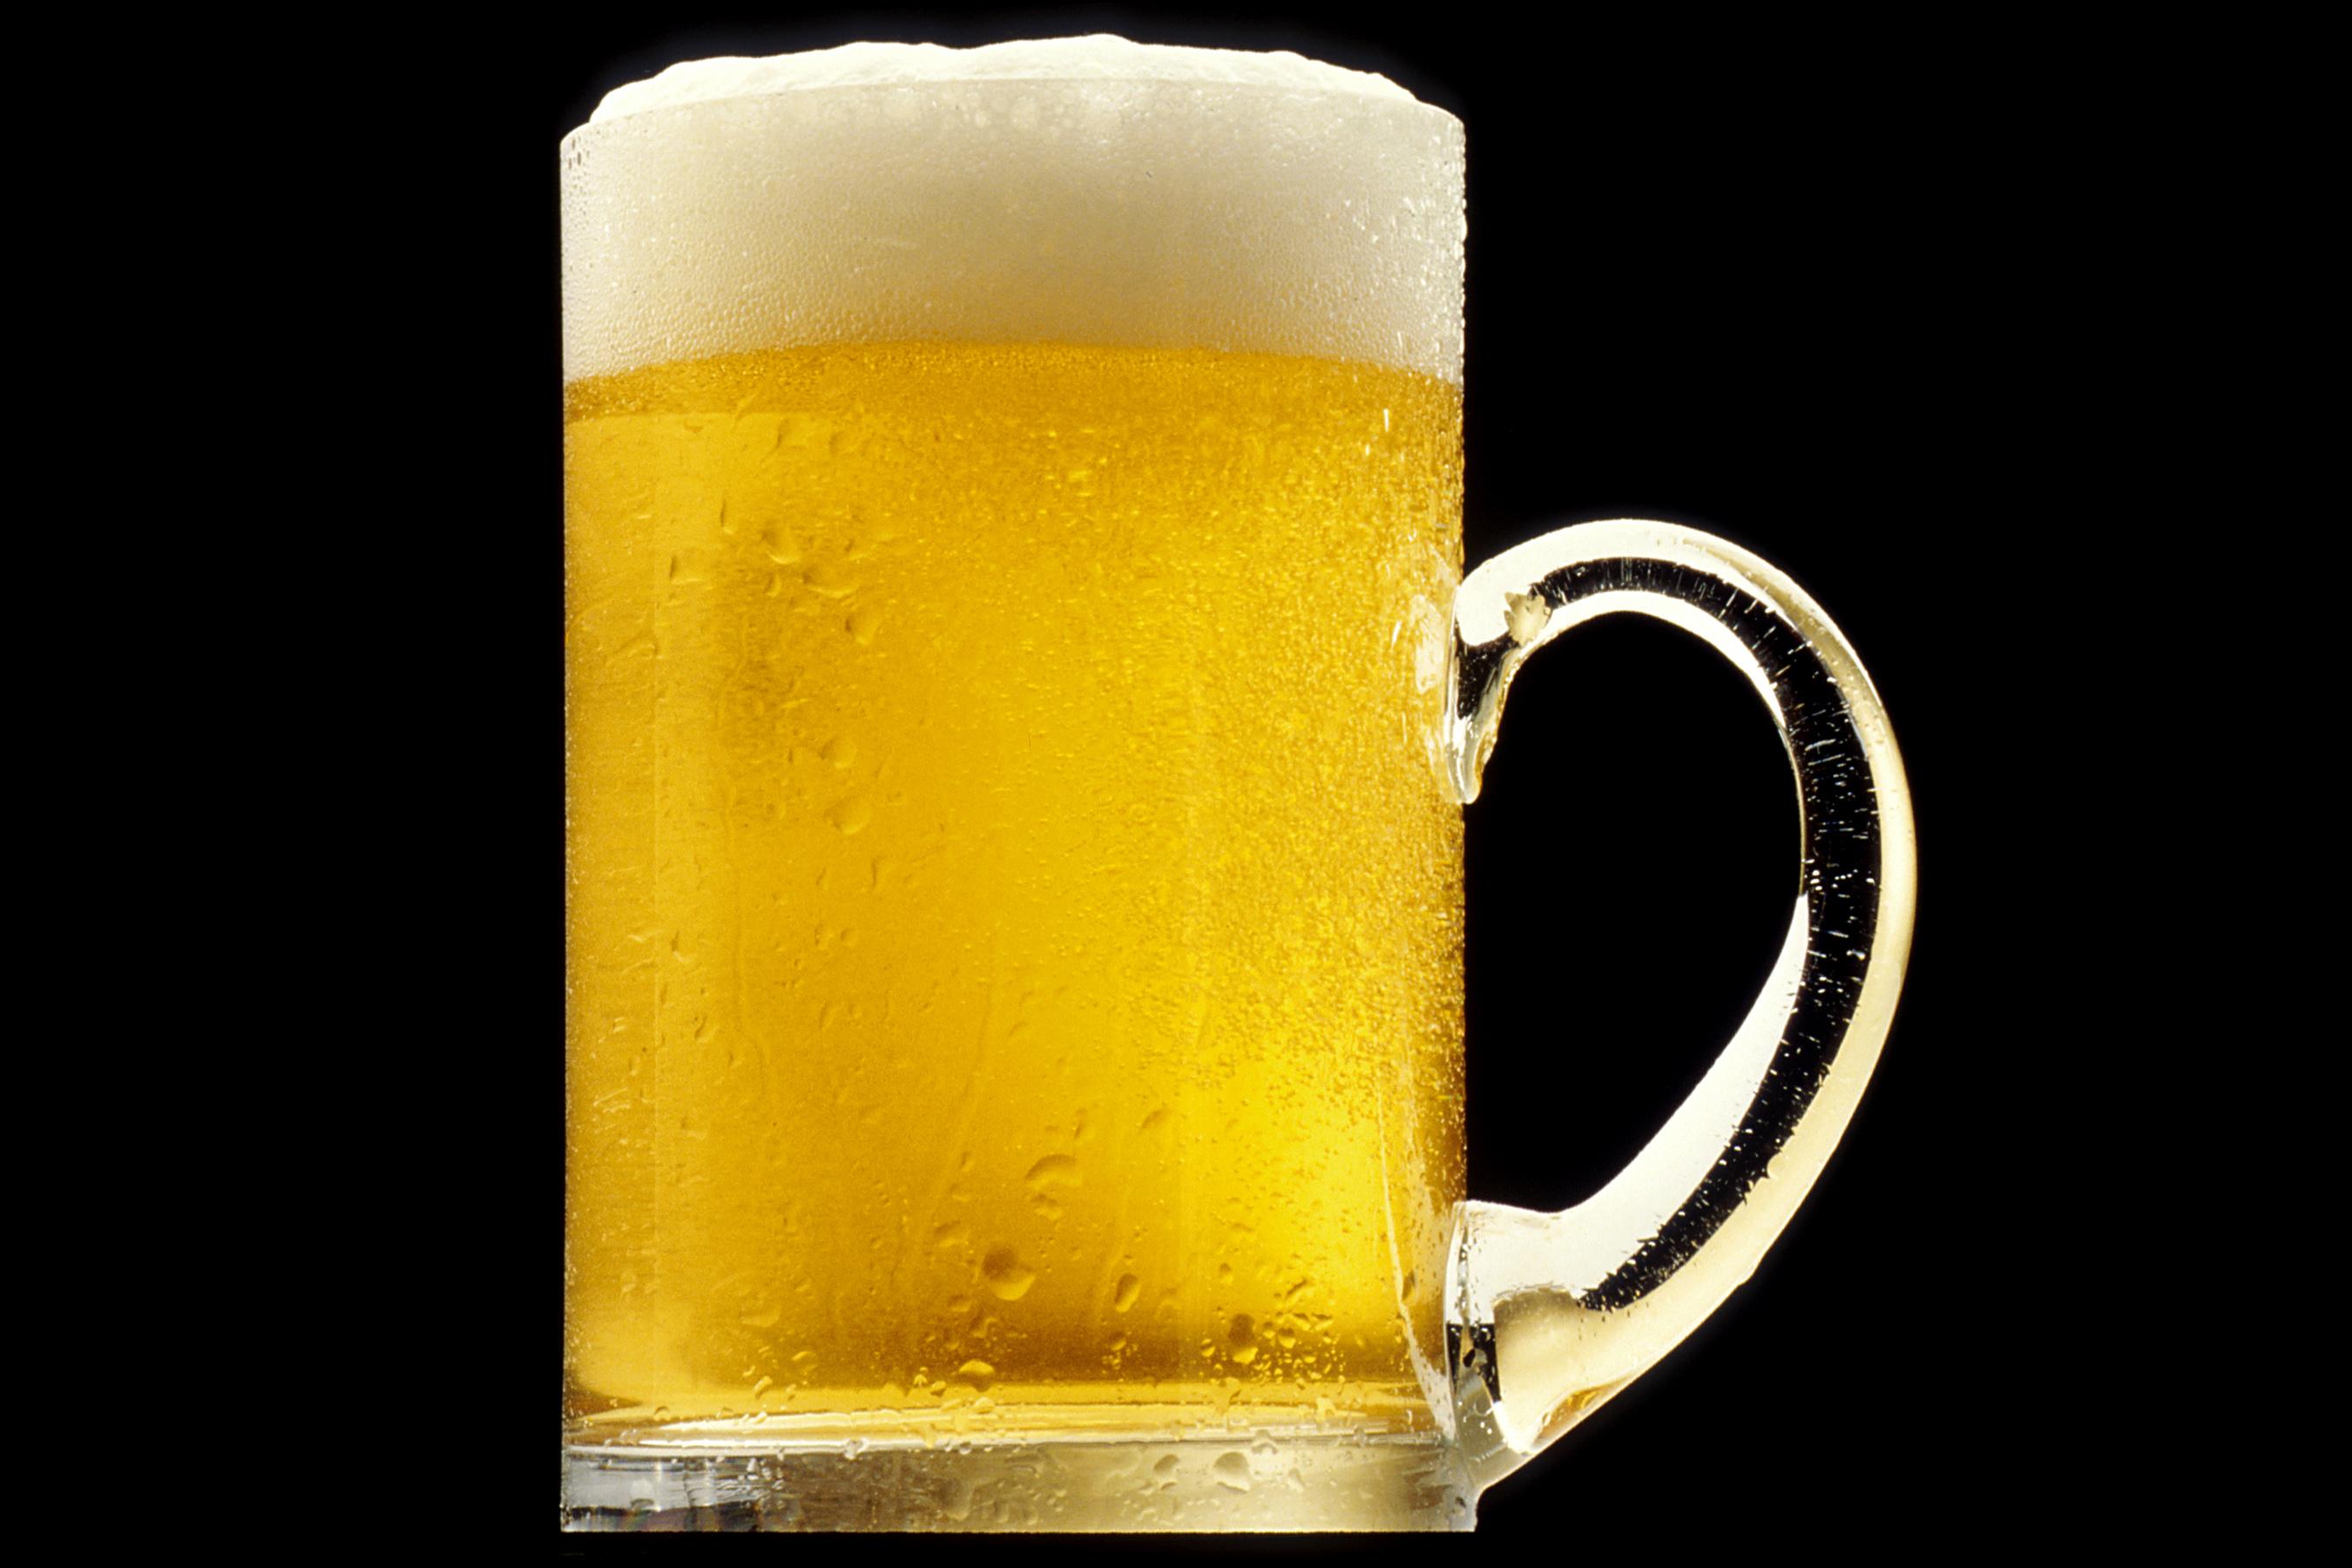 Ice Cold Beer Mug